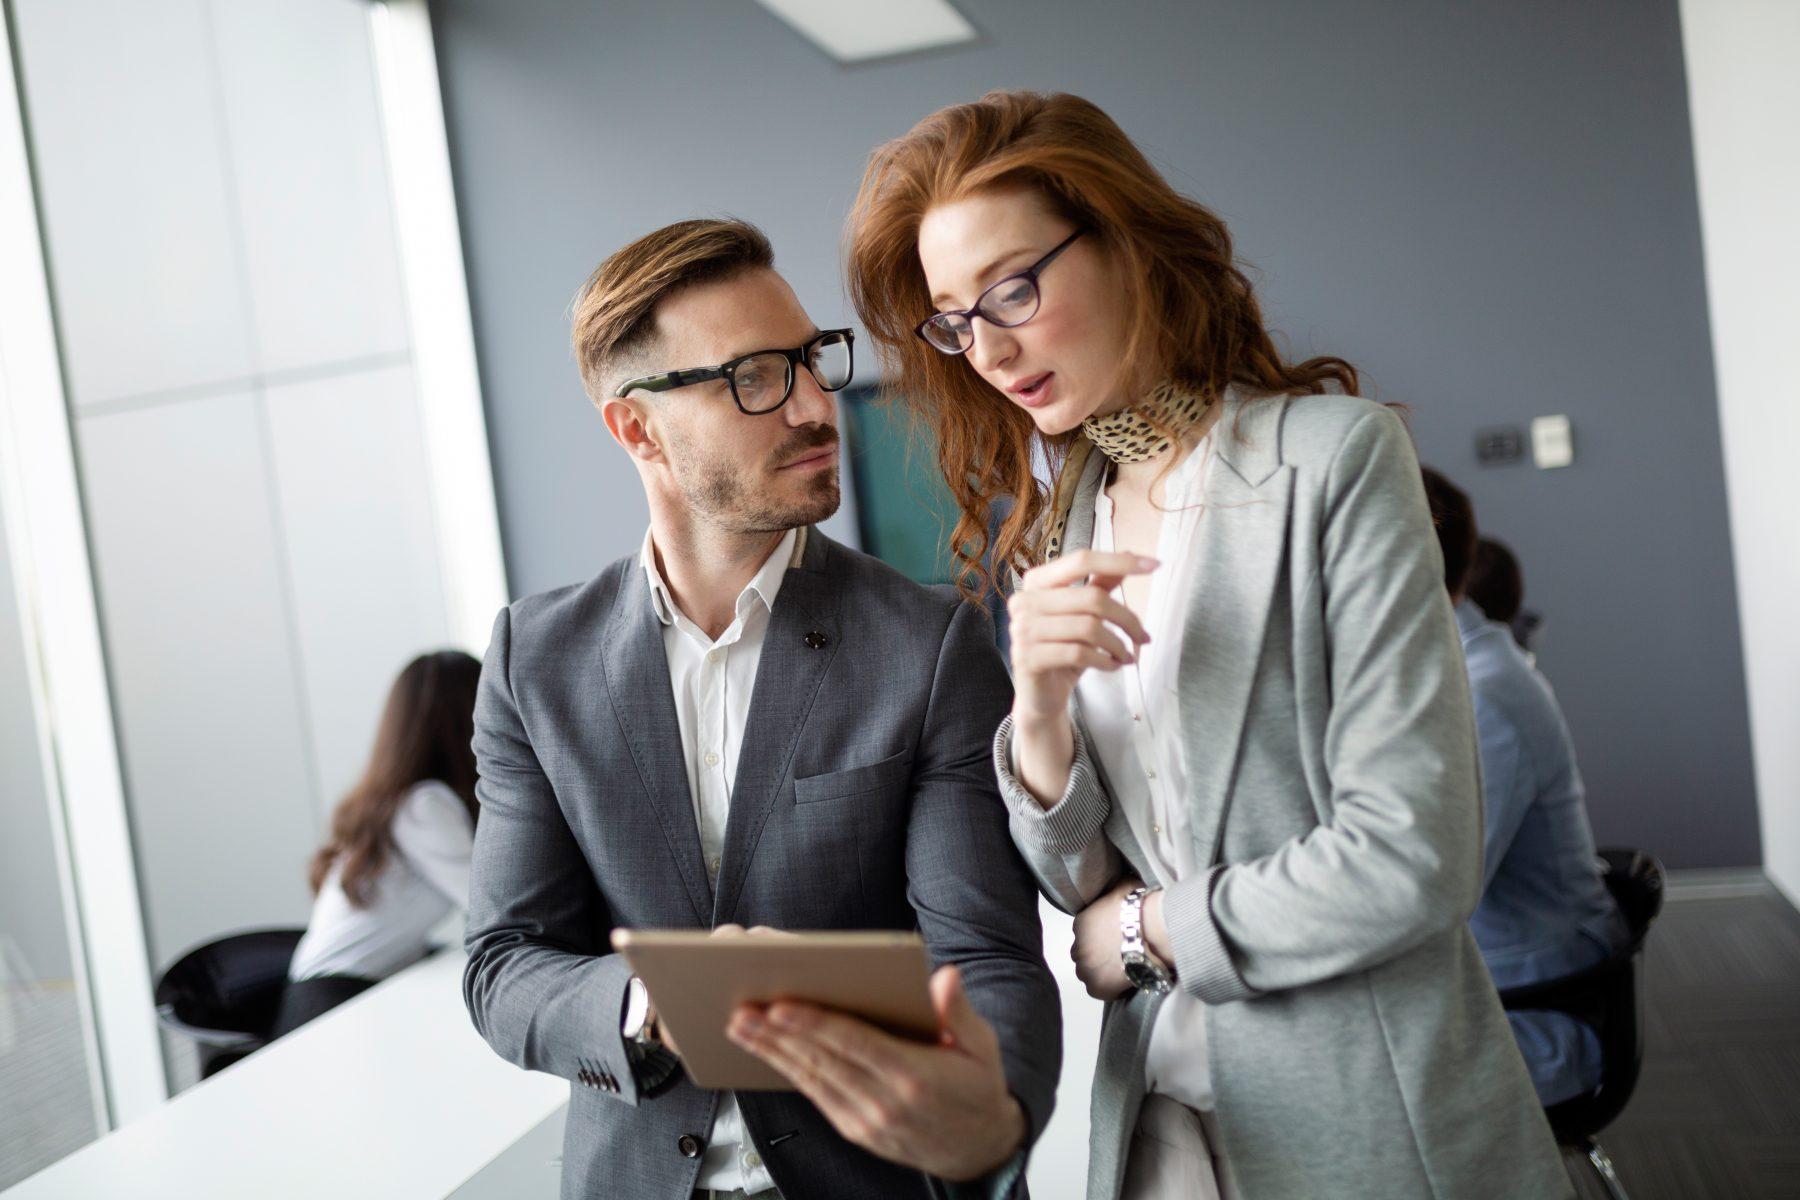 Streamline your online collaboration - Five ways that Daminion adds value.Streamline your online collaboration - Five ways that Daminion adds value.